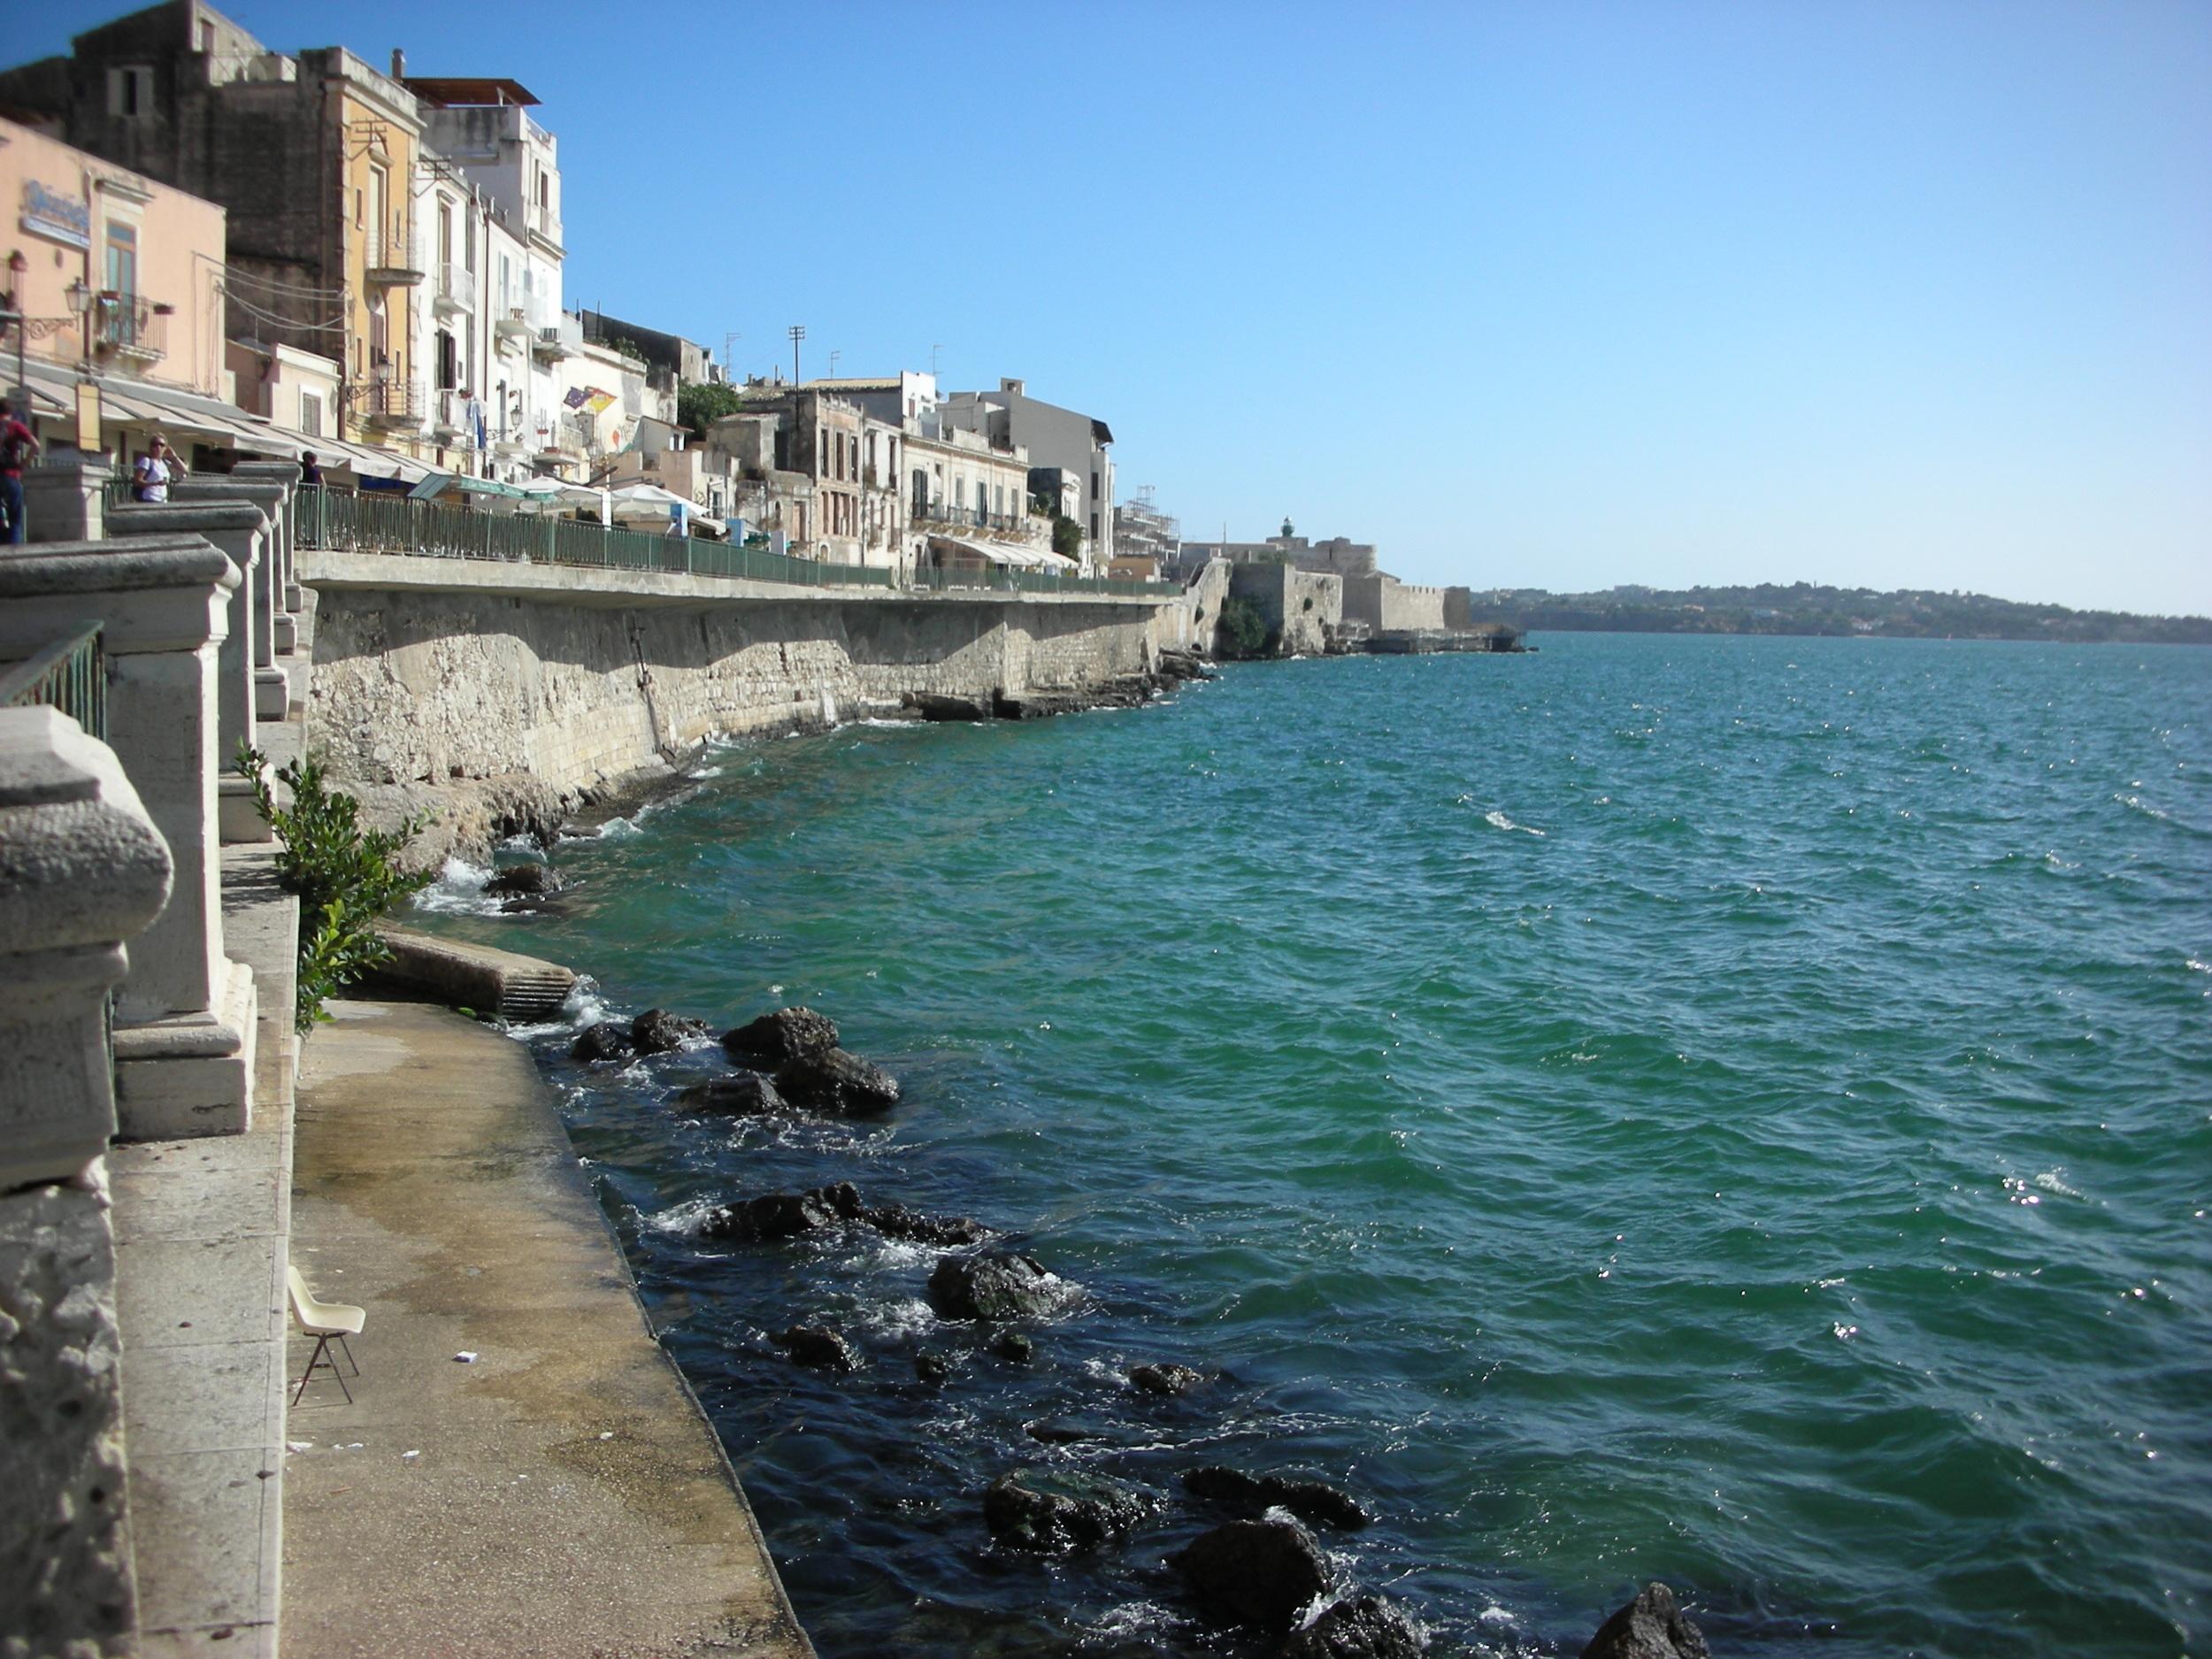 CRO Italy web 2008 - 37.JPG